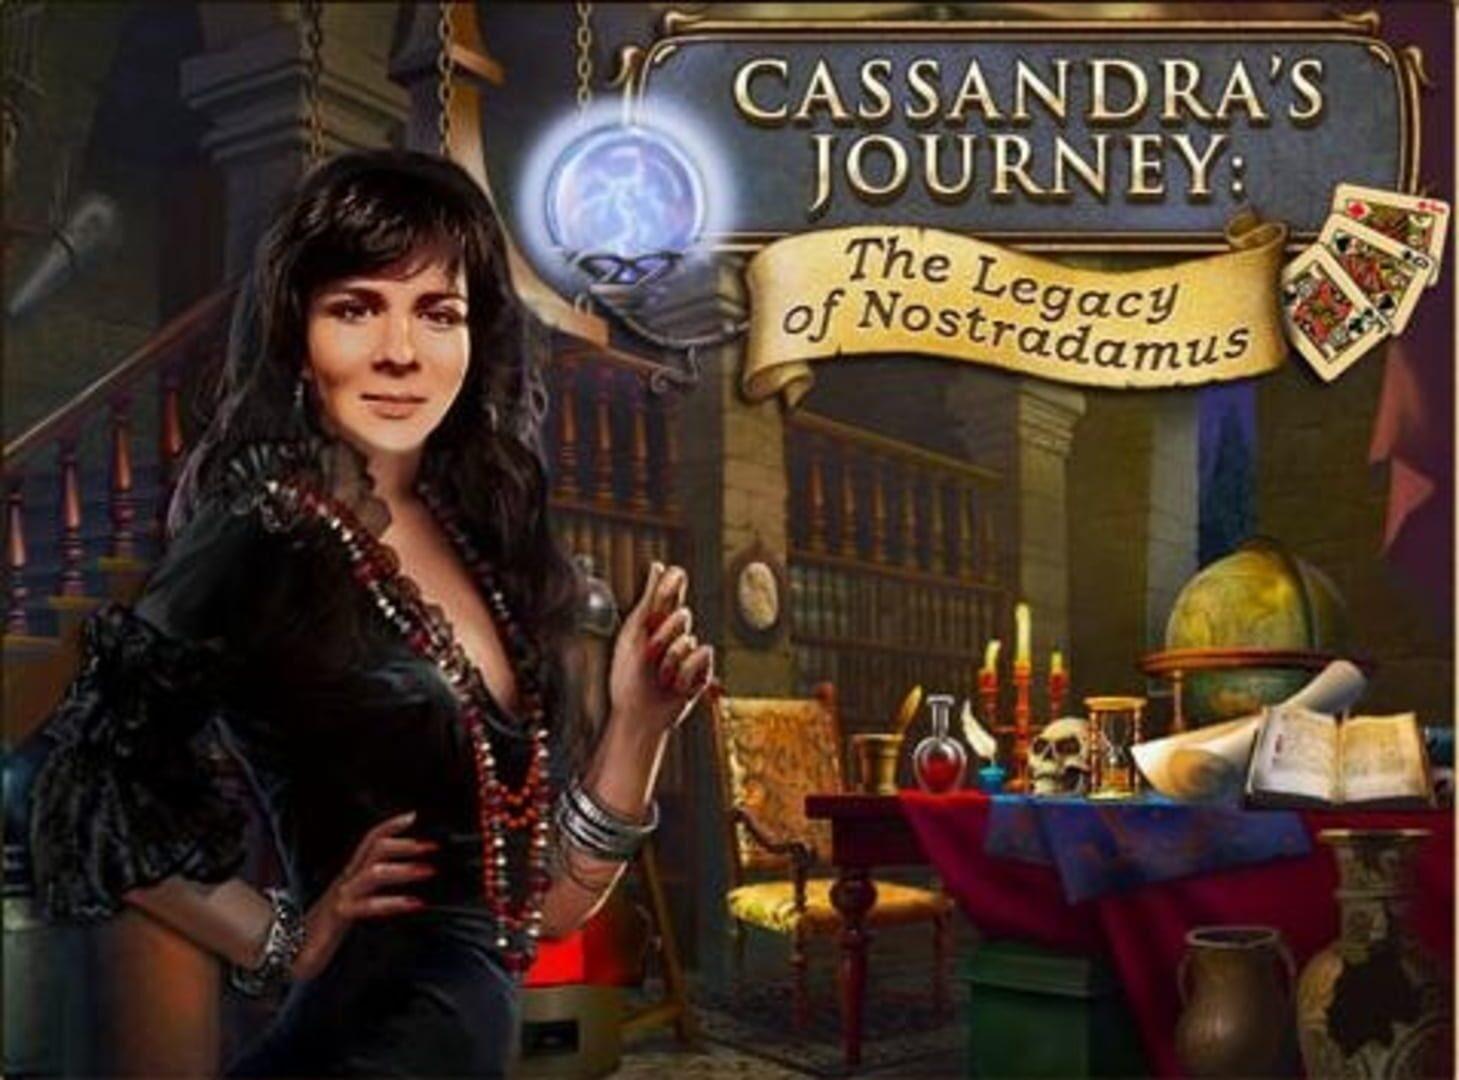 buy Cassandra's Journey: The Legacy of Nostradamus cd key for all platform